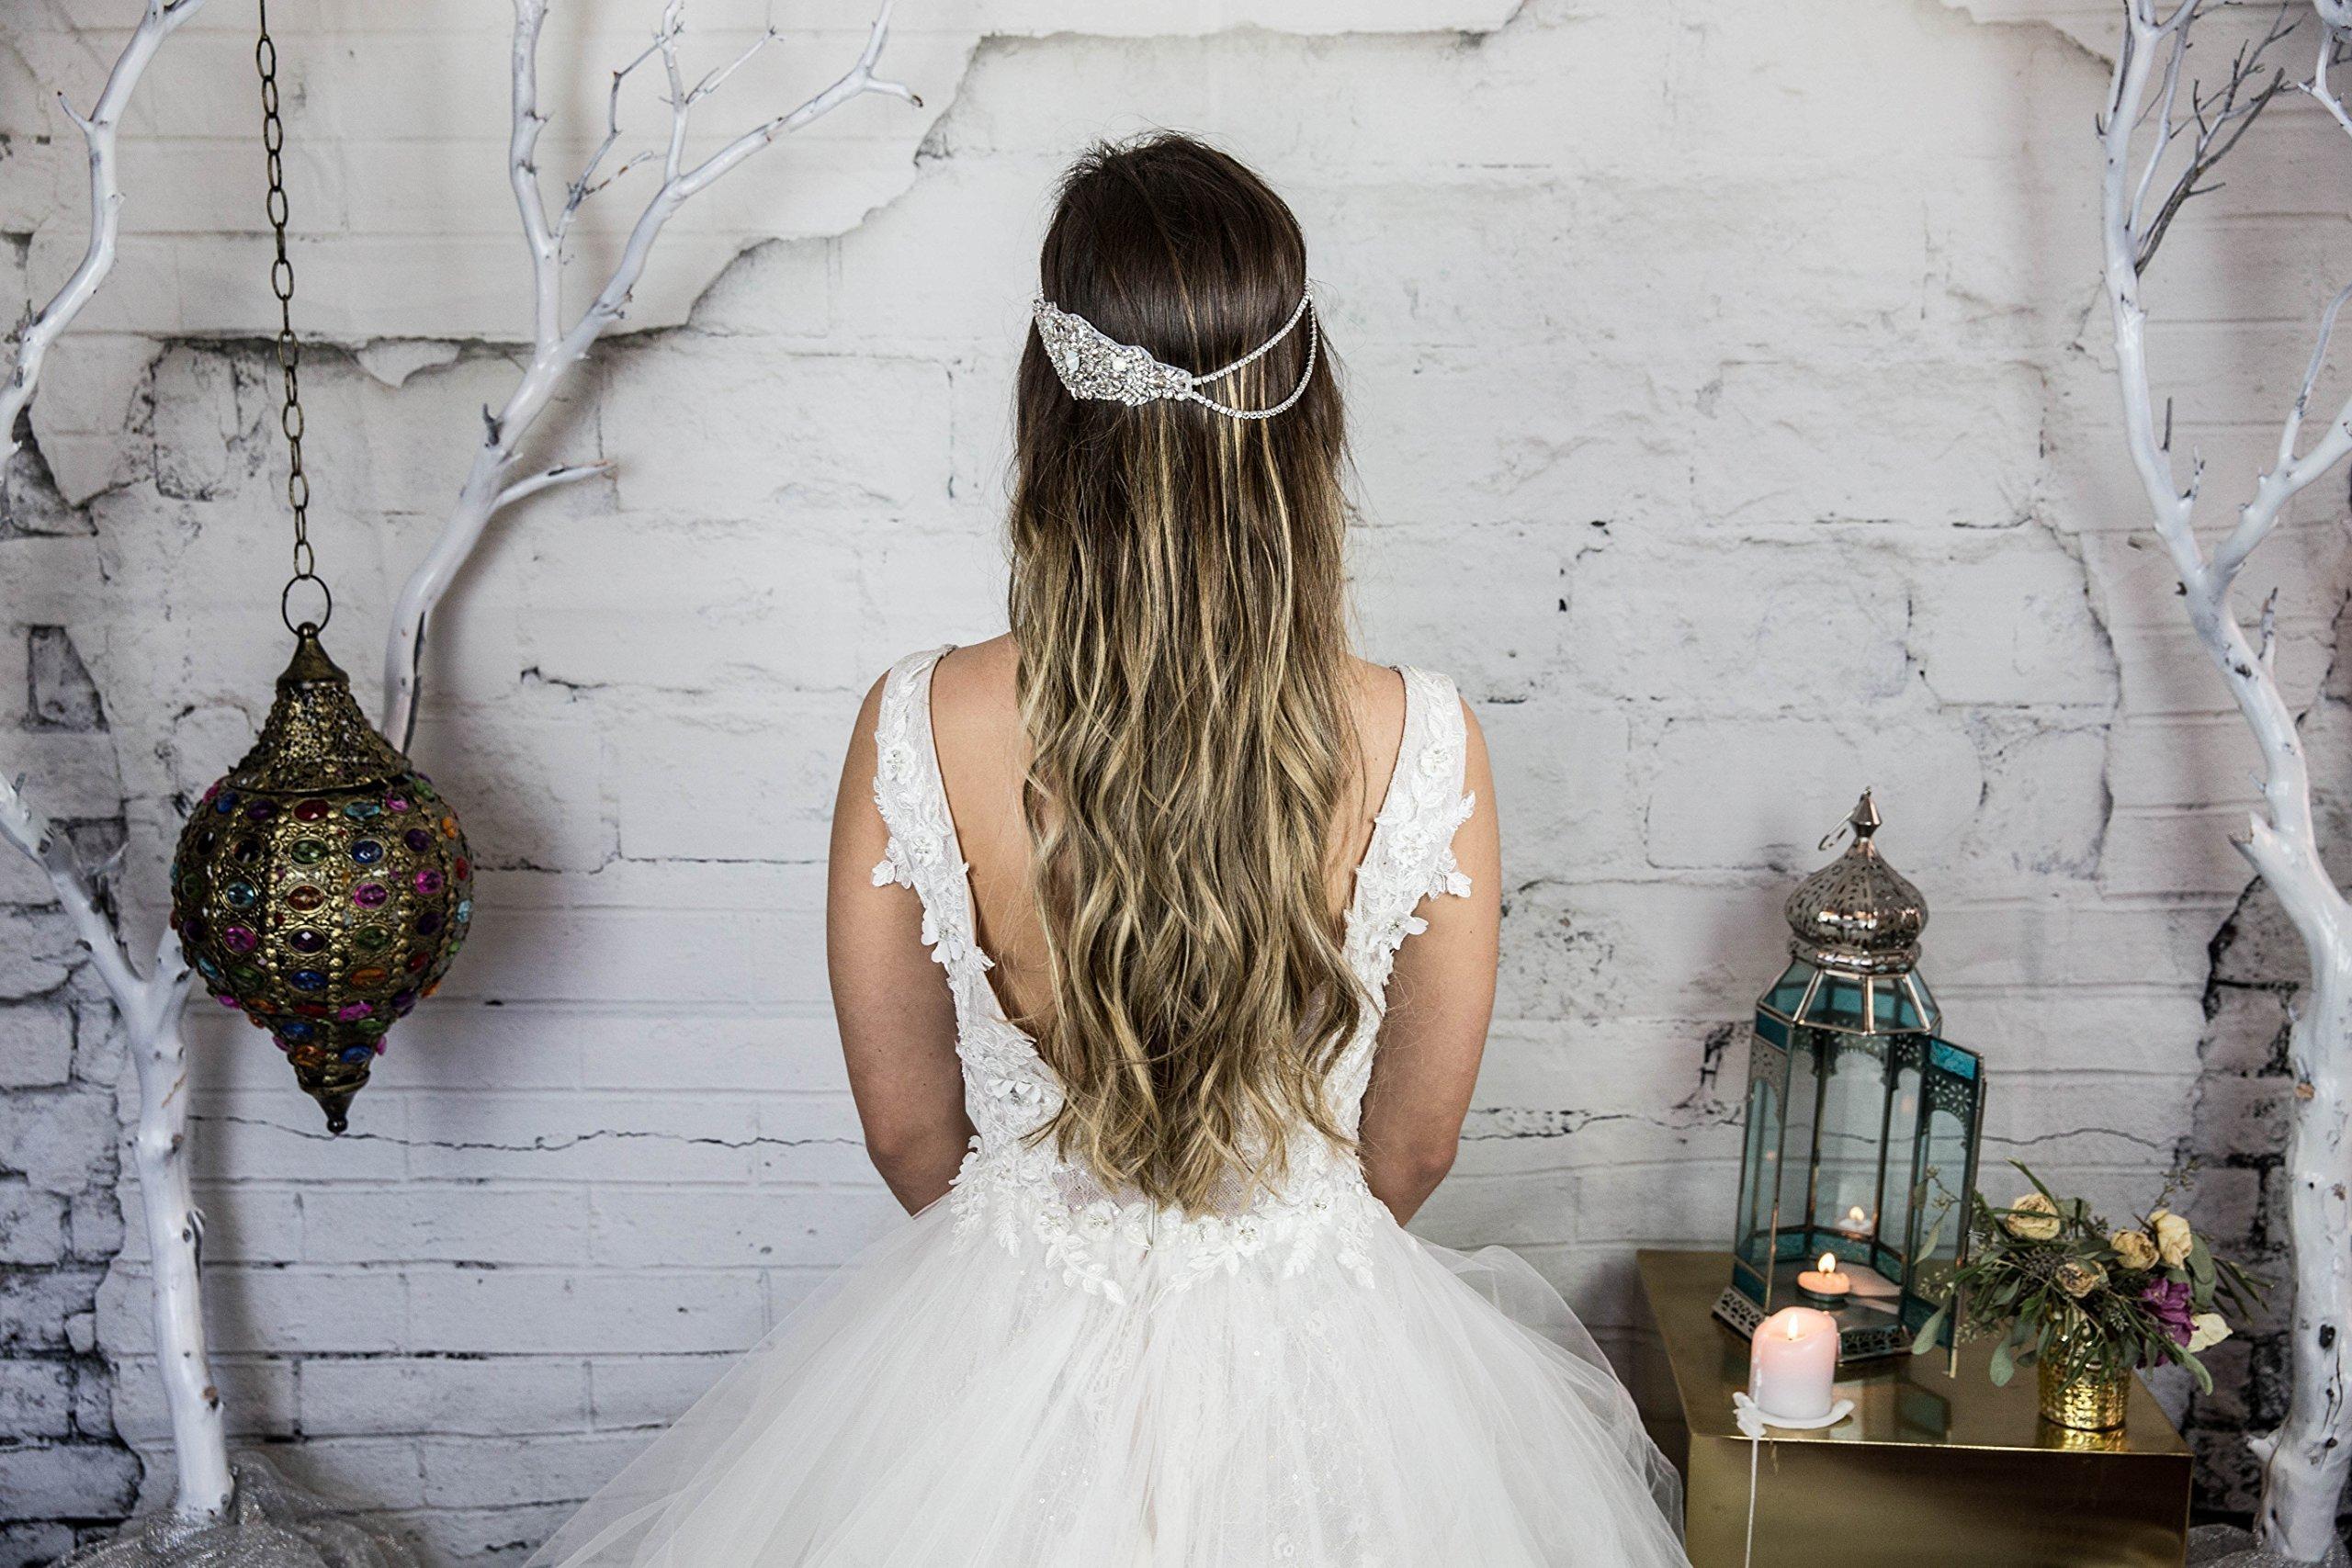 Crystal Bridal Head Chain / Wedding Headband / Crystal Head Chain Bohemian Hair Piece / Hair Jewelry for the Bride / Boho Beach Weddings Hair Accessories / Headchain / Head Piece / Weddings / Handmade